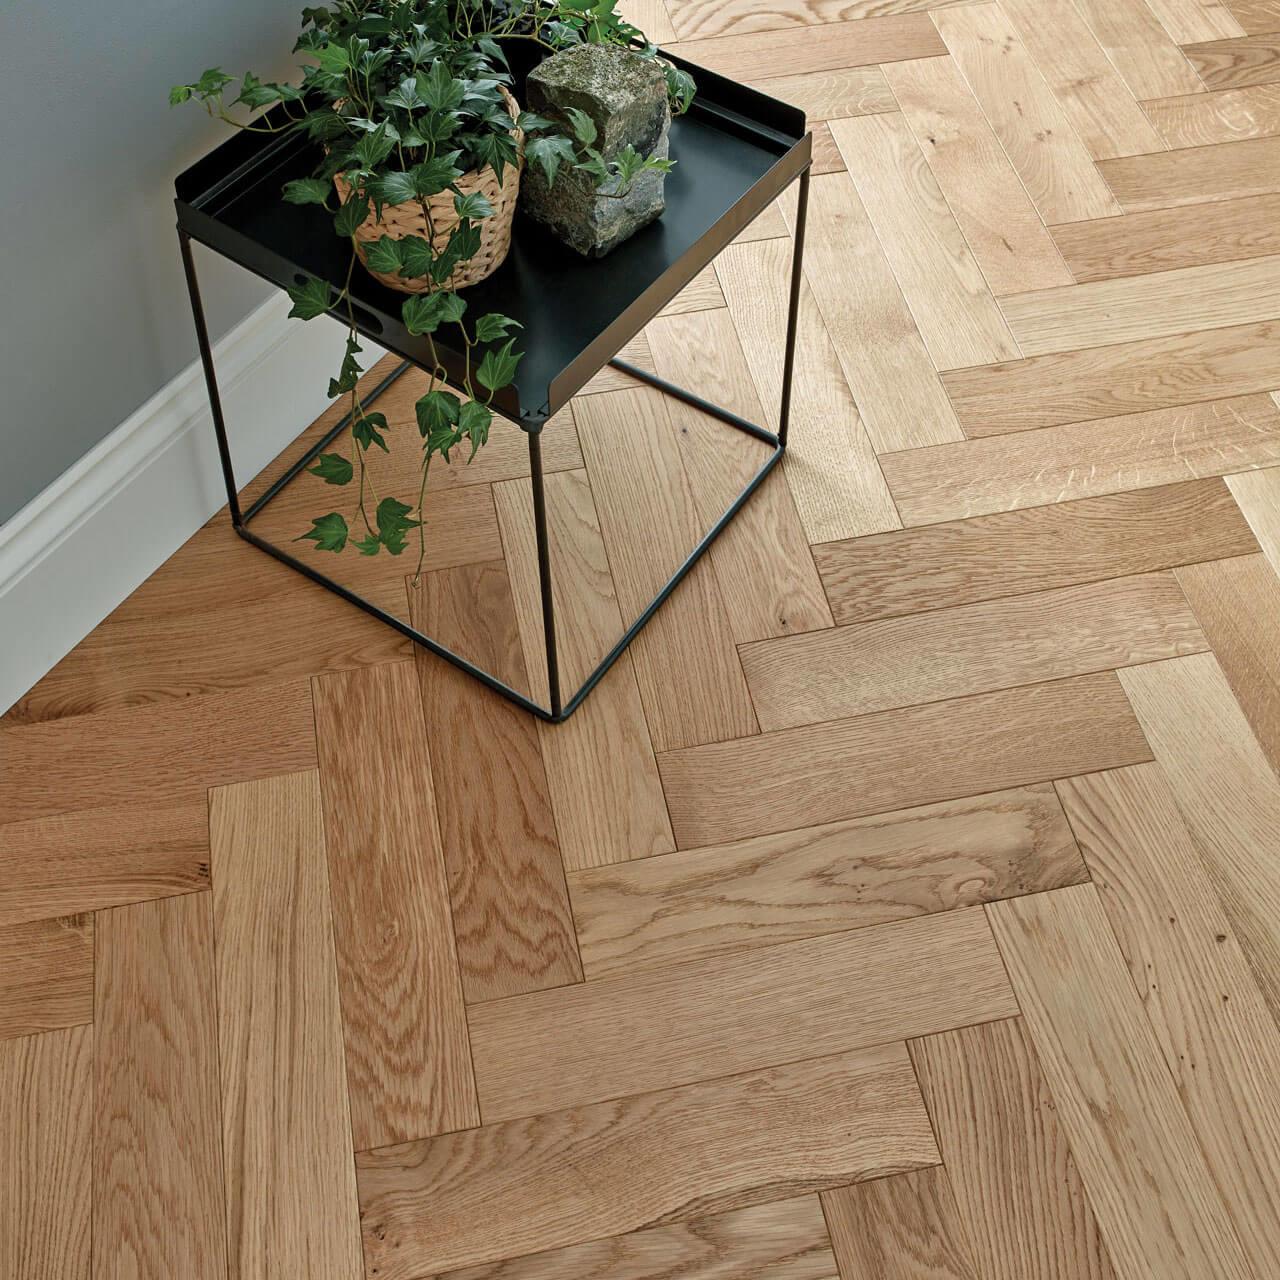 Wood Goodrich Herringbone Natural Oak Brushed Matt Lacquered Engineered Flooring 32 Gna 001